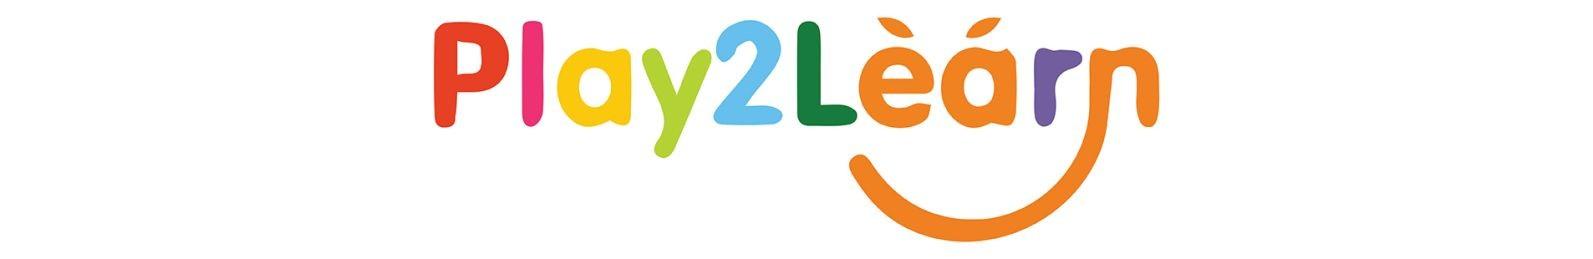 Play2Learn